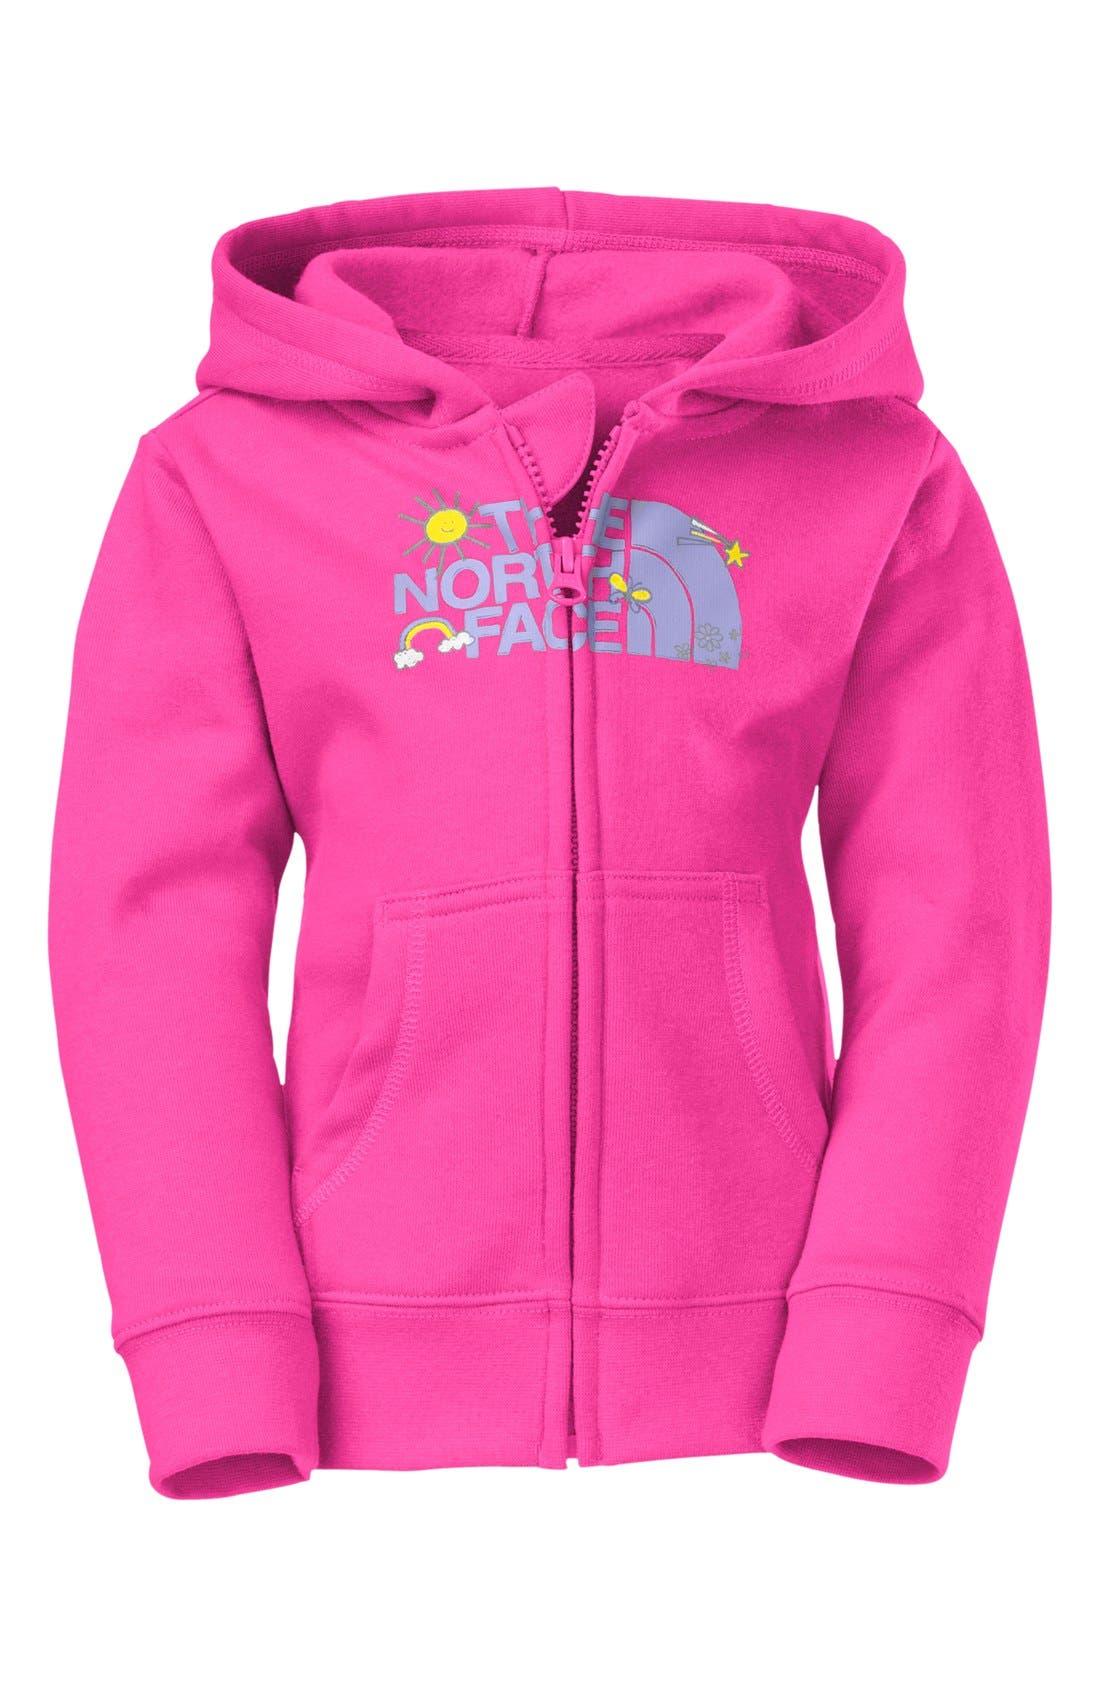 Main Image - The North Face Full Zip Hoodie (Toddler Girls)